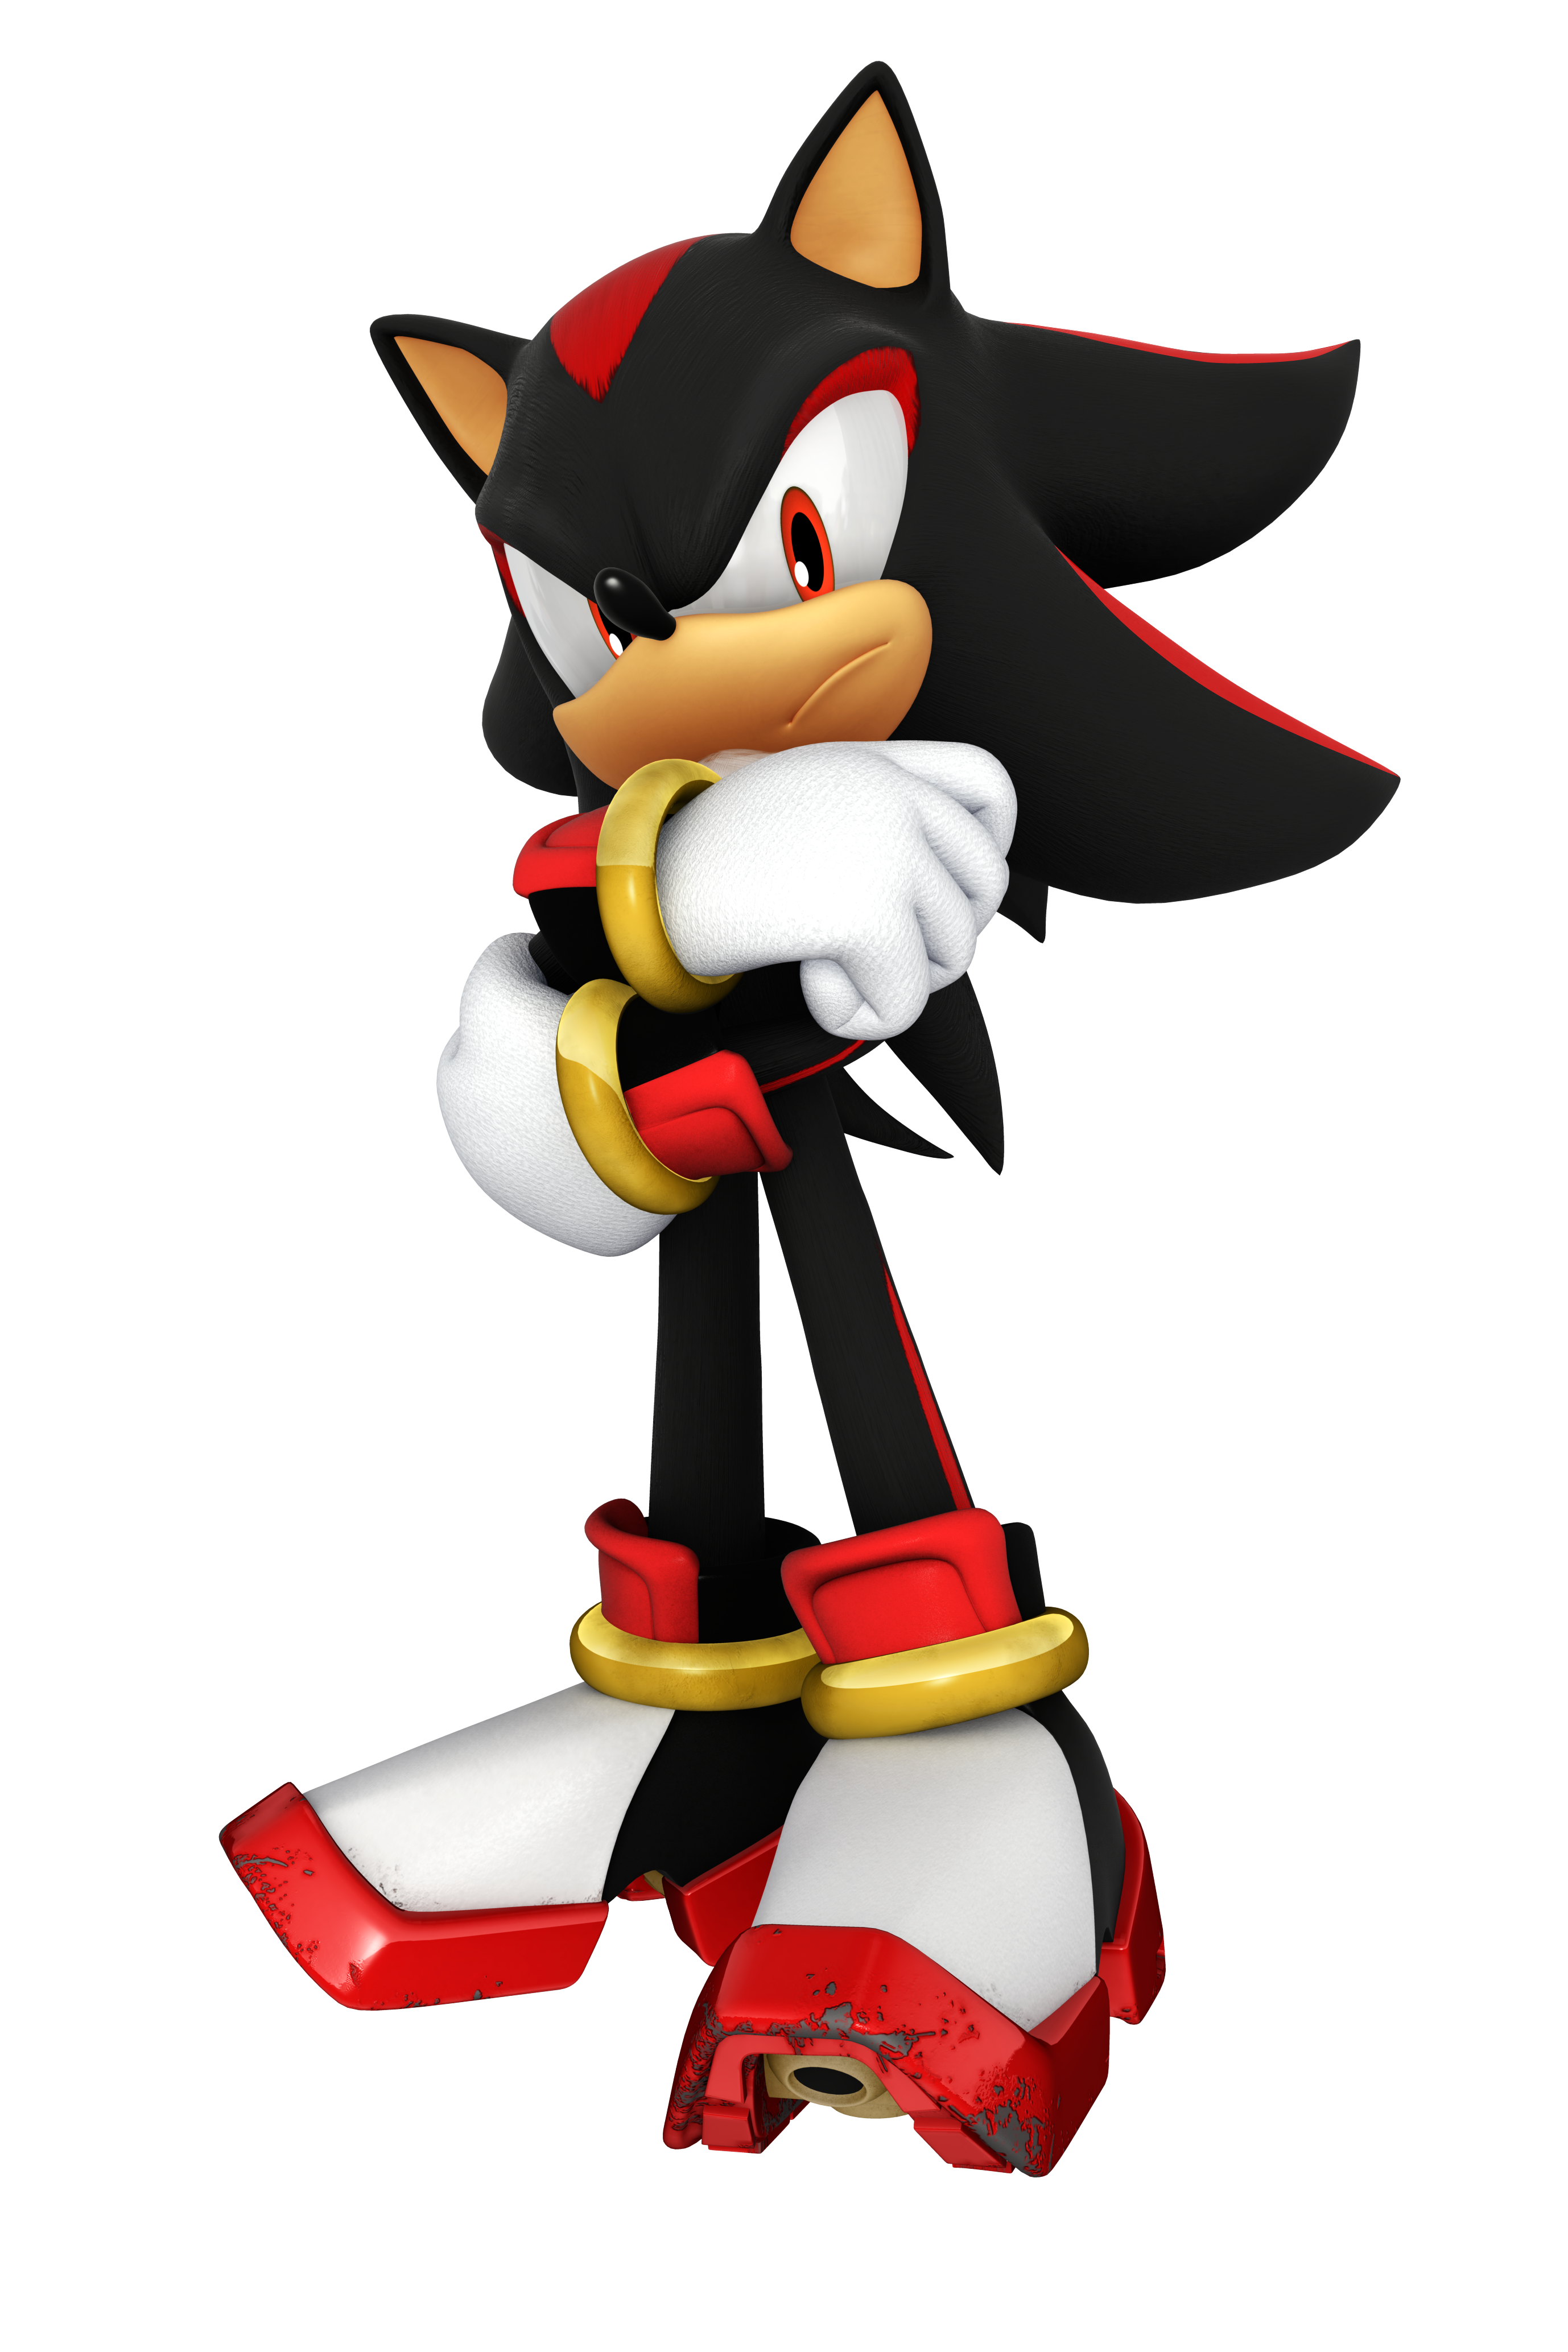 Shadow the Hedgehog (BearfootTruck's Universe)